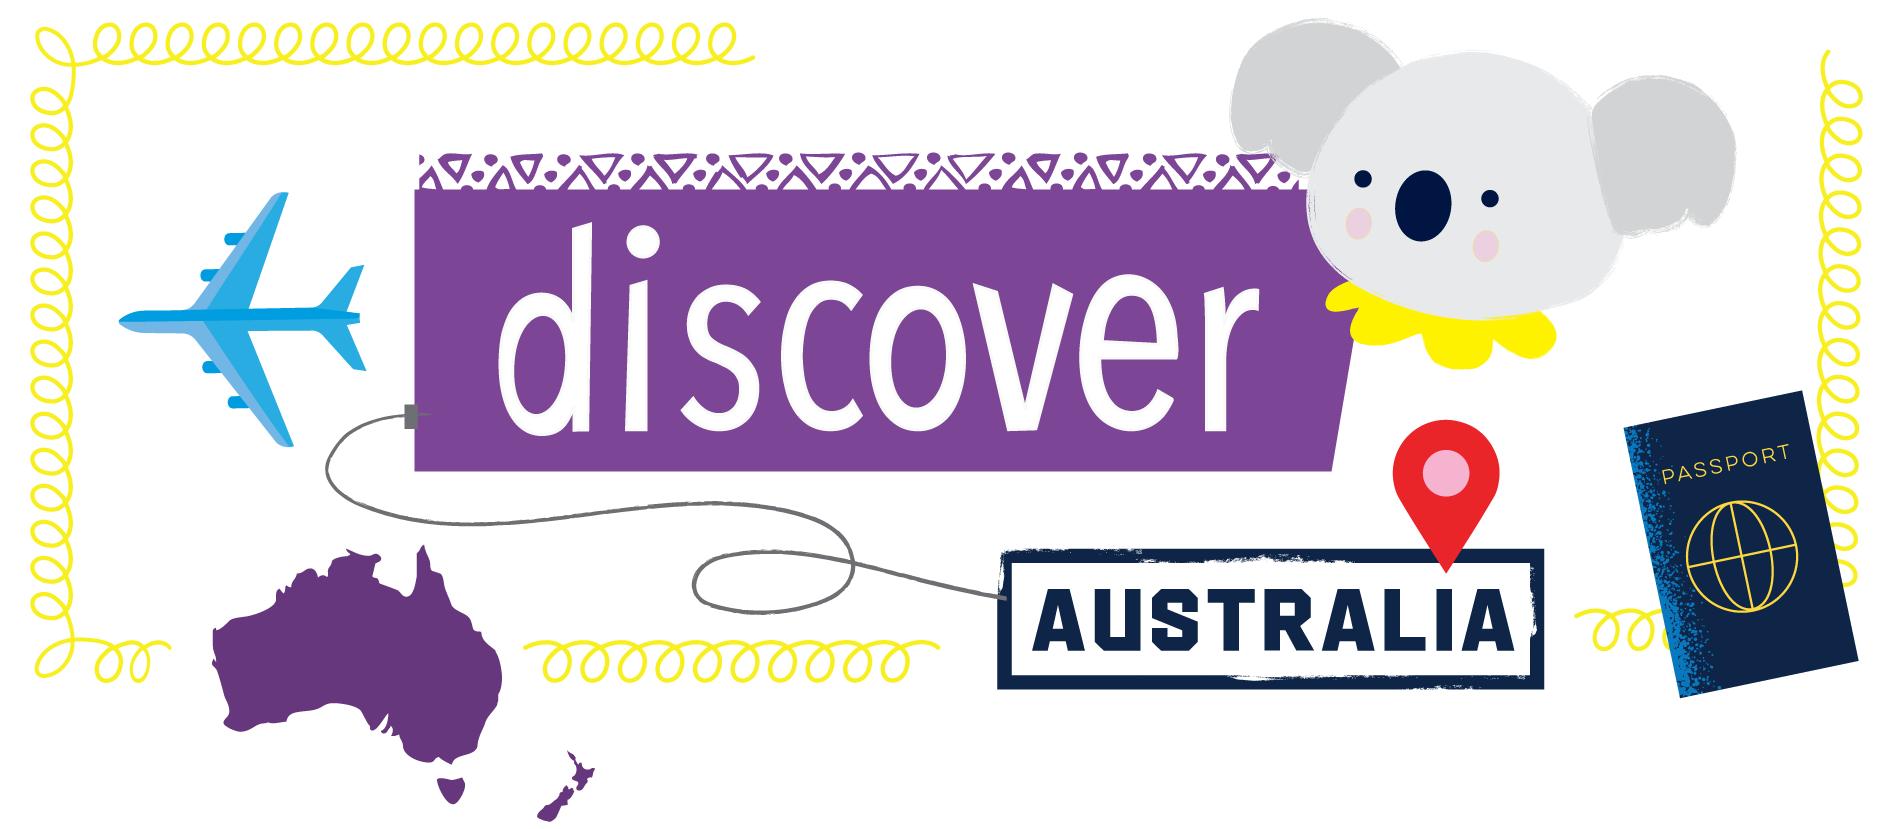 Discover Australia!